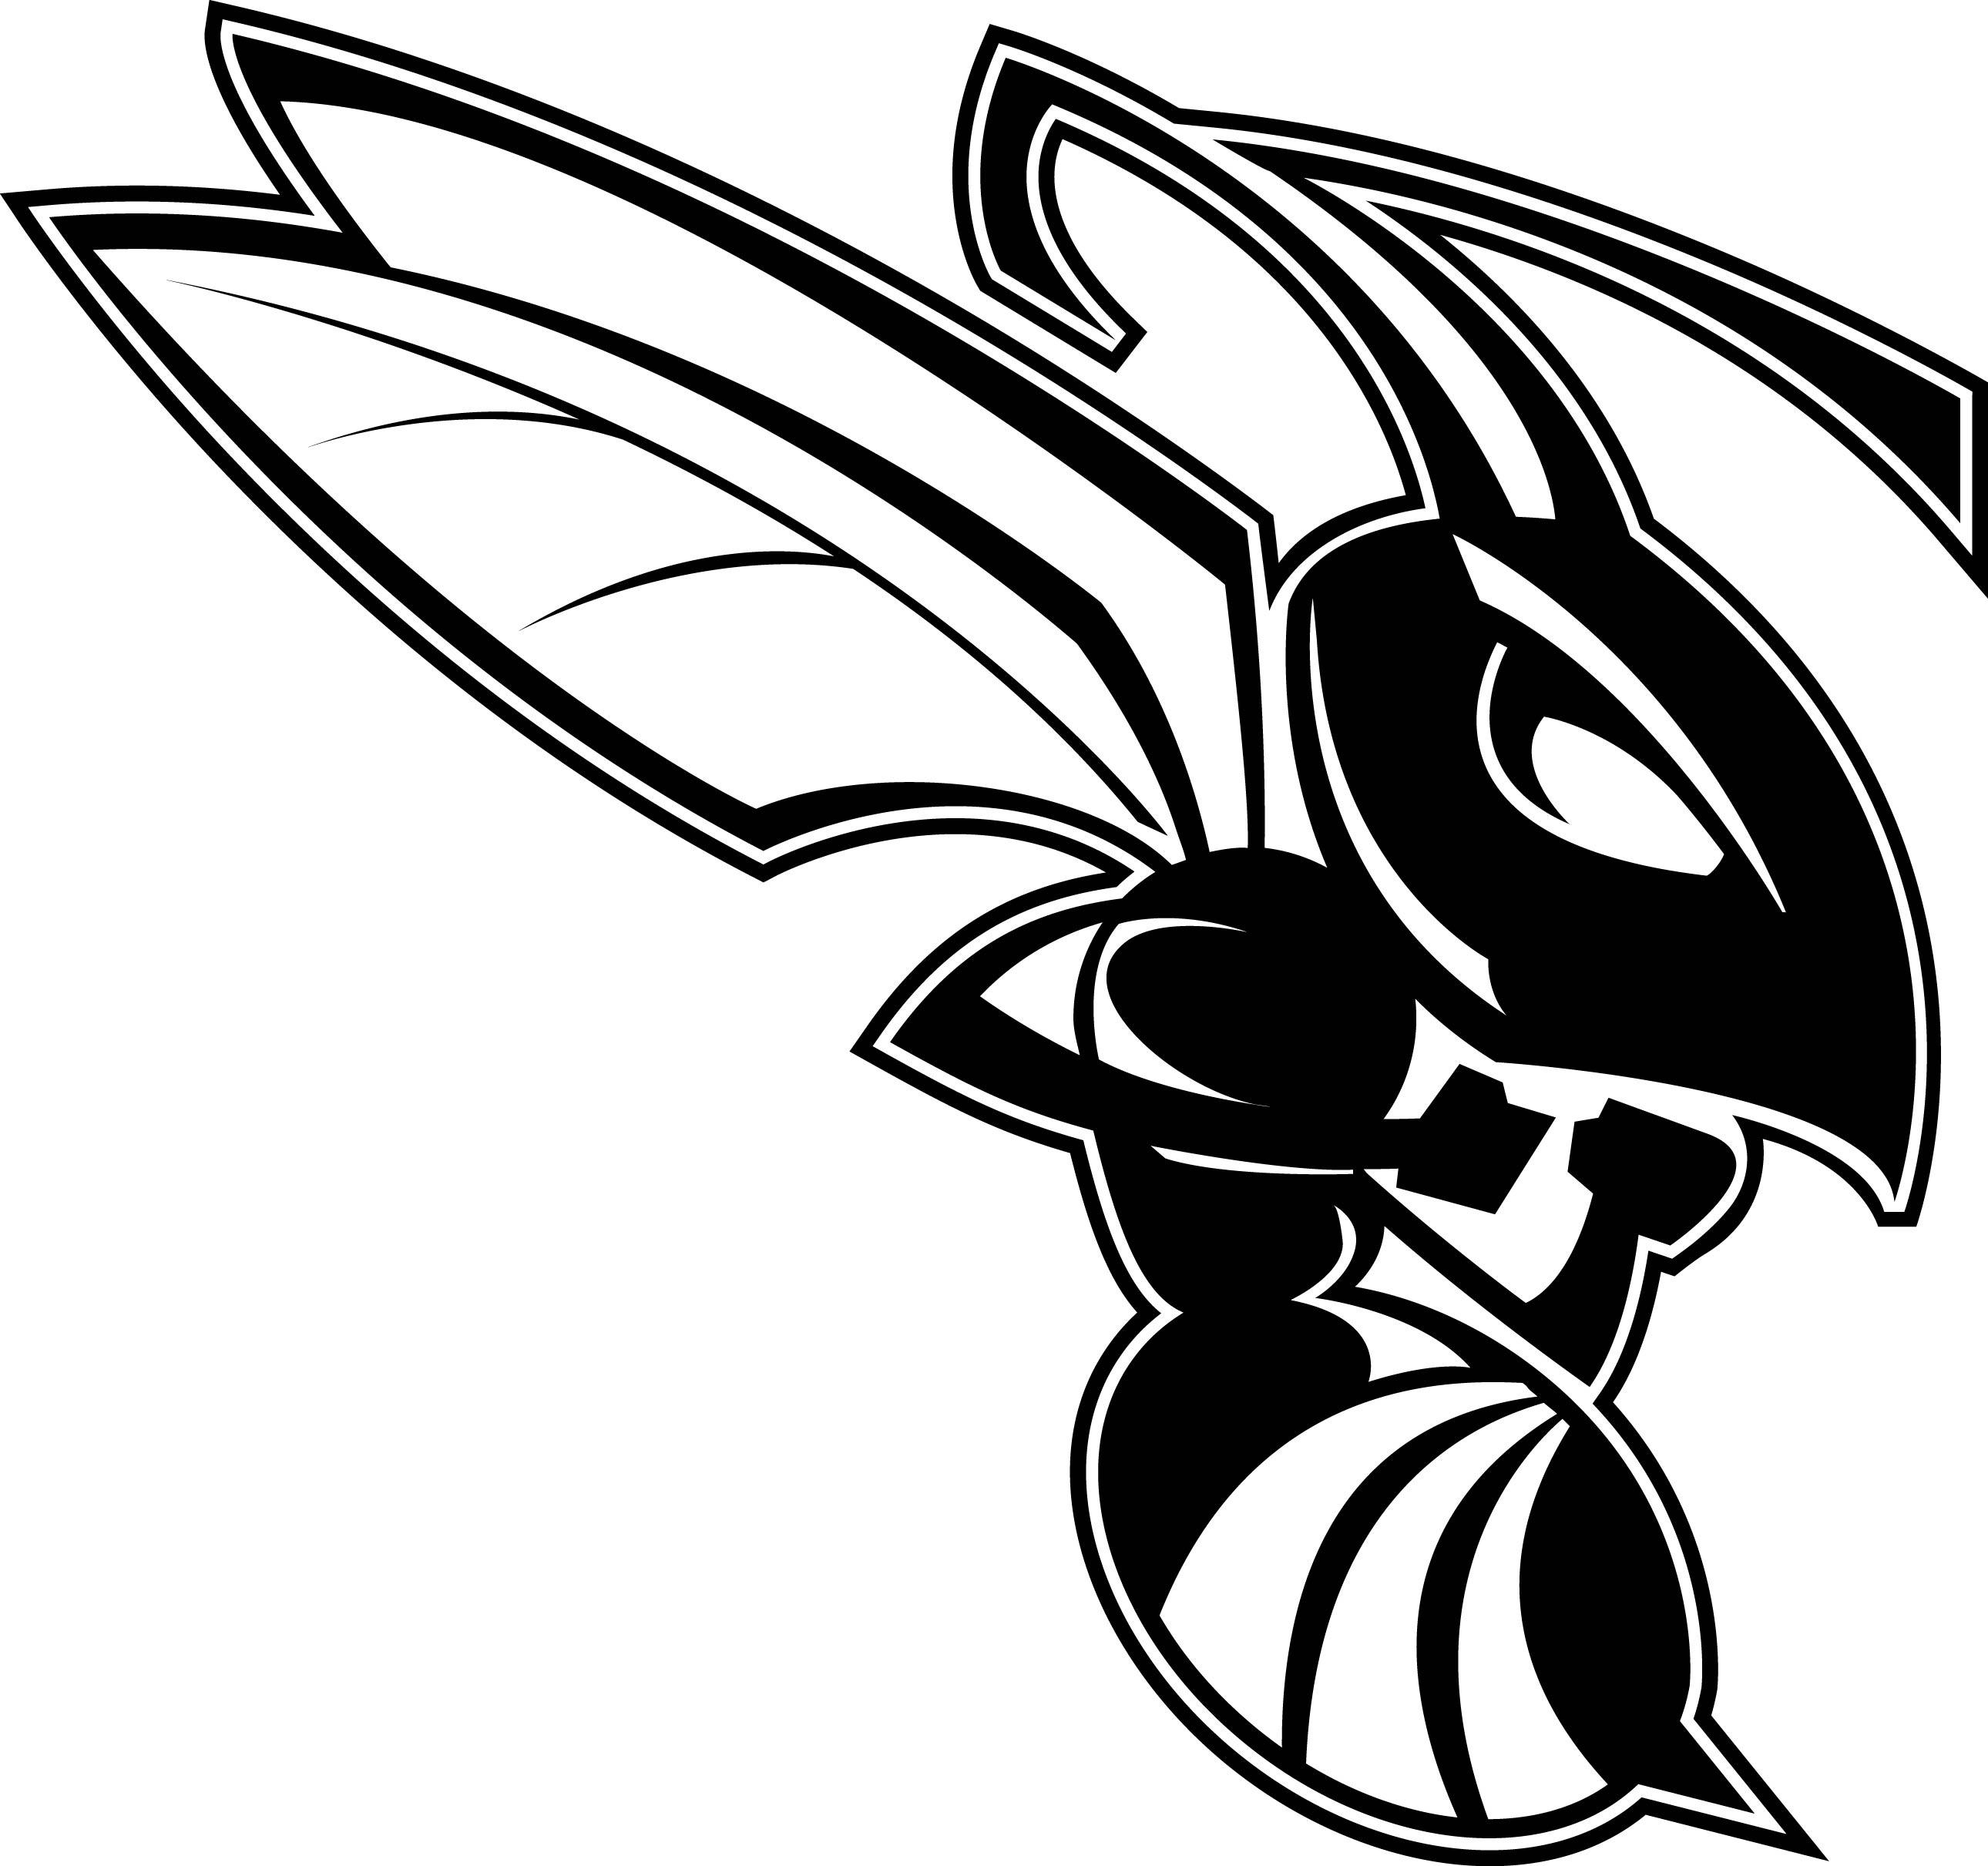 Black white hornet pictures Unique Hornet Black and White.